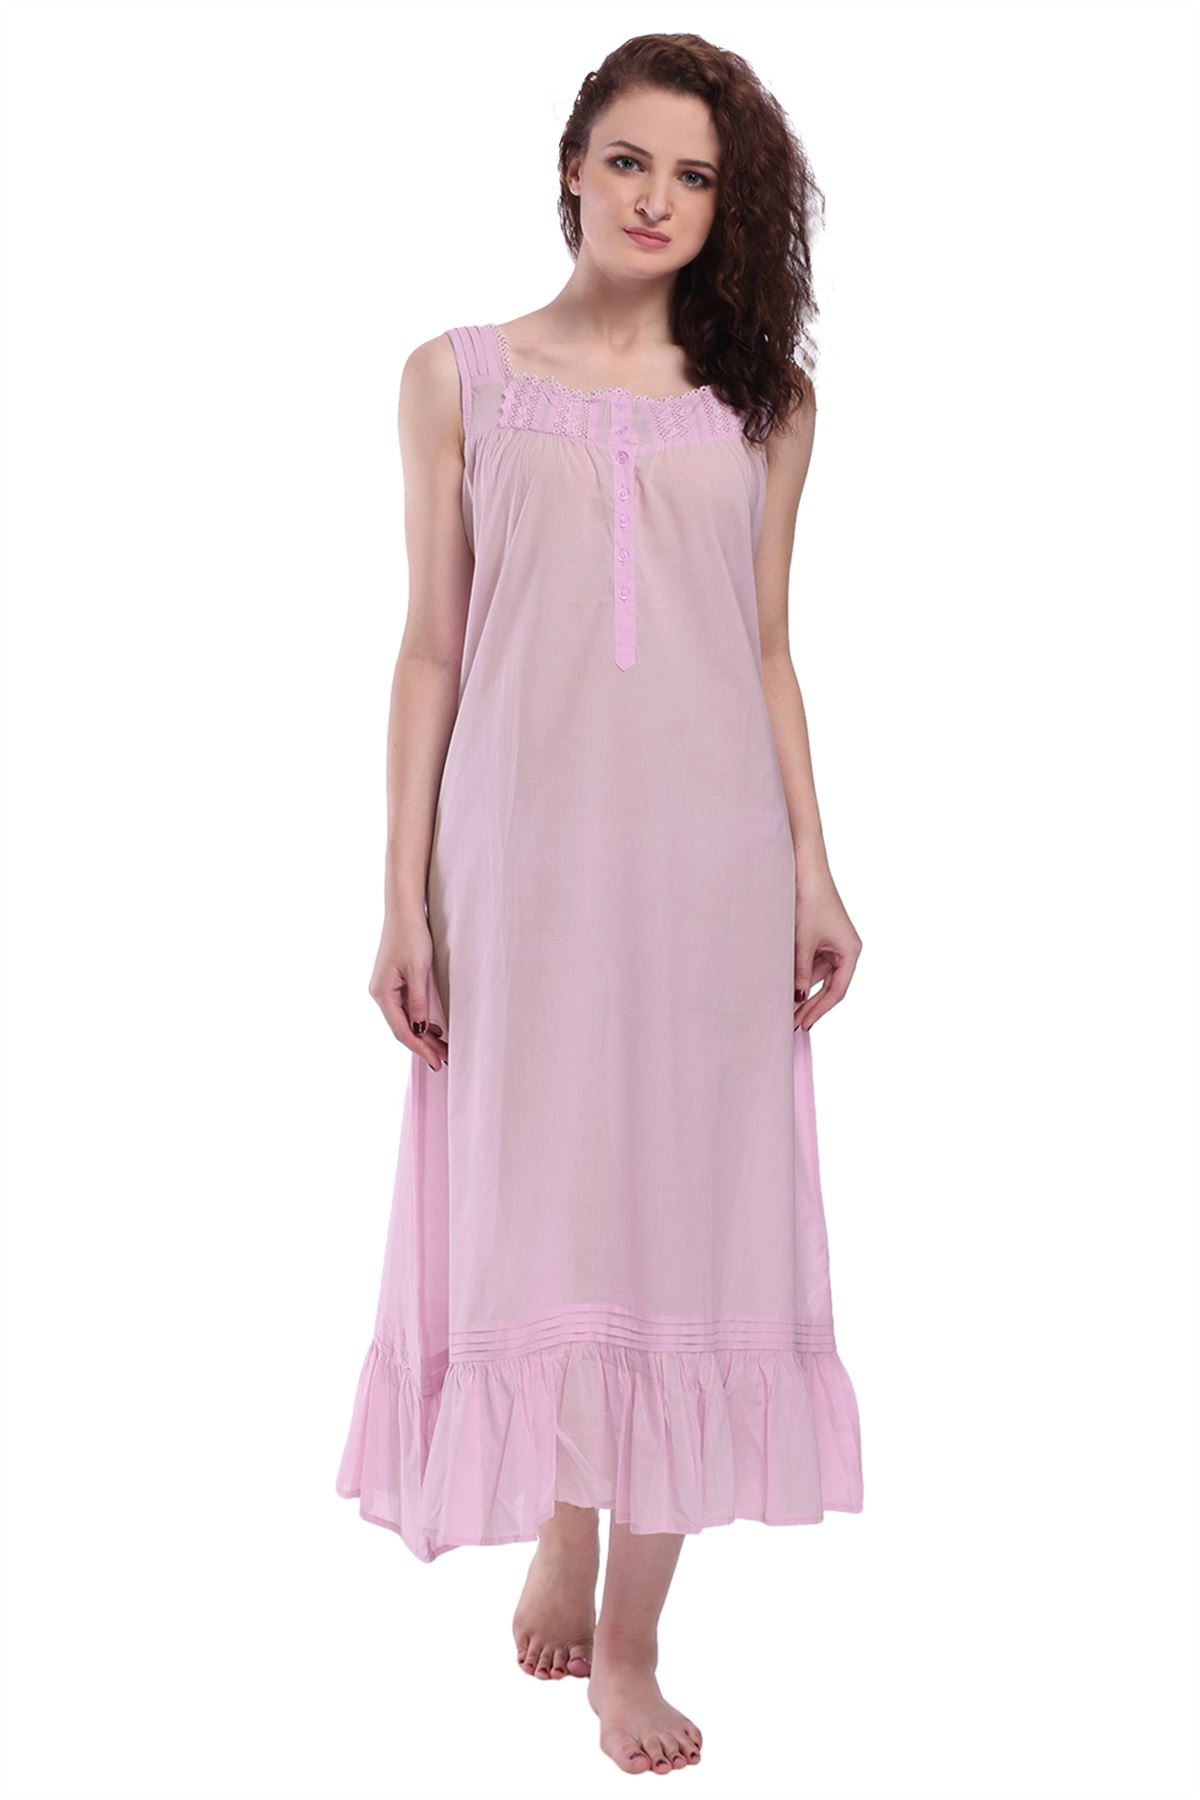 Womens-Sleeveless-Victorian-Style-Nightgown-Long-Sleepwear-Cotton-Nightdress